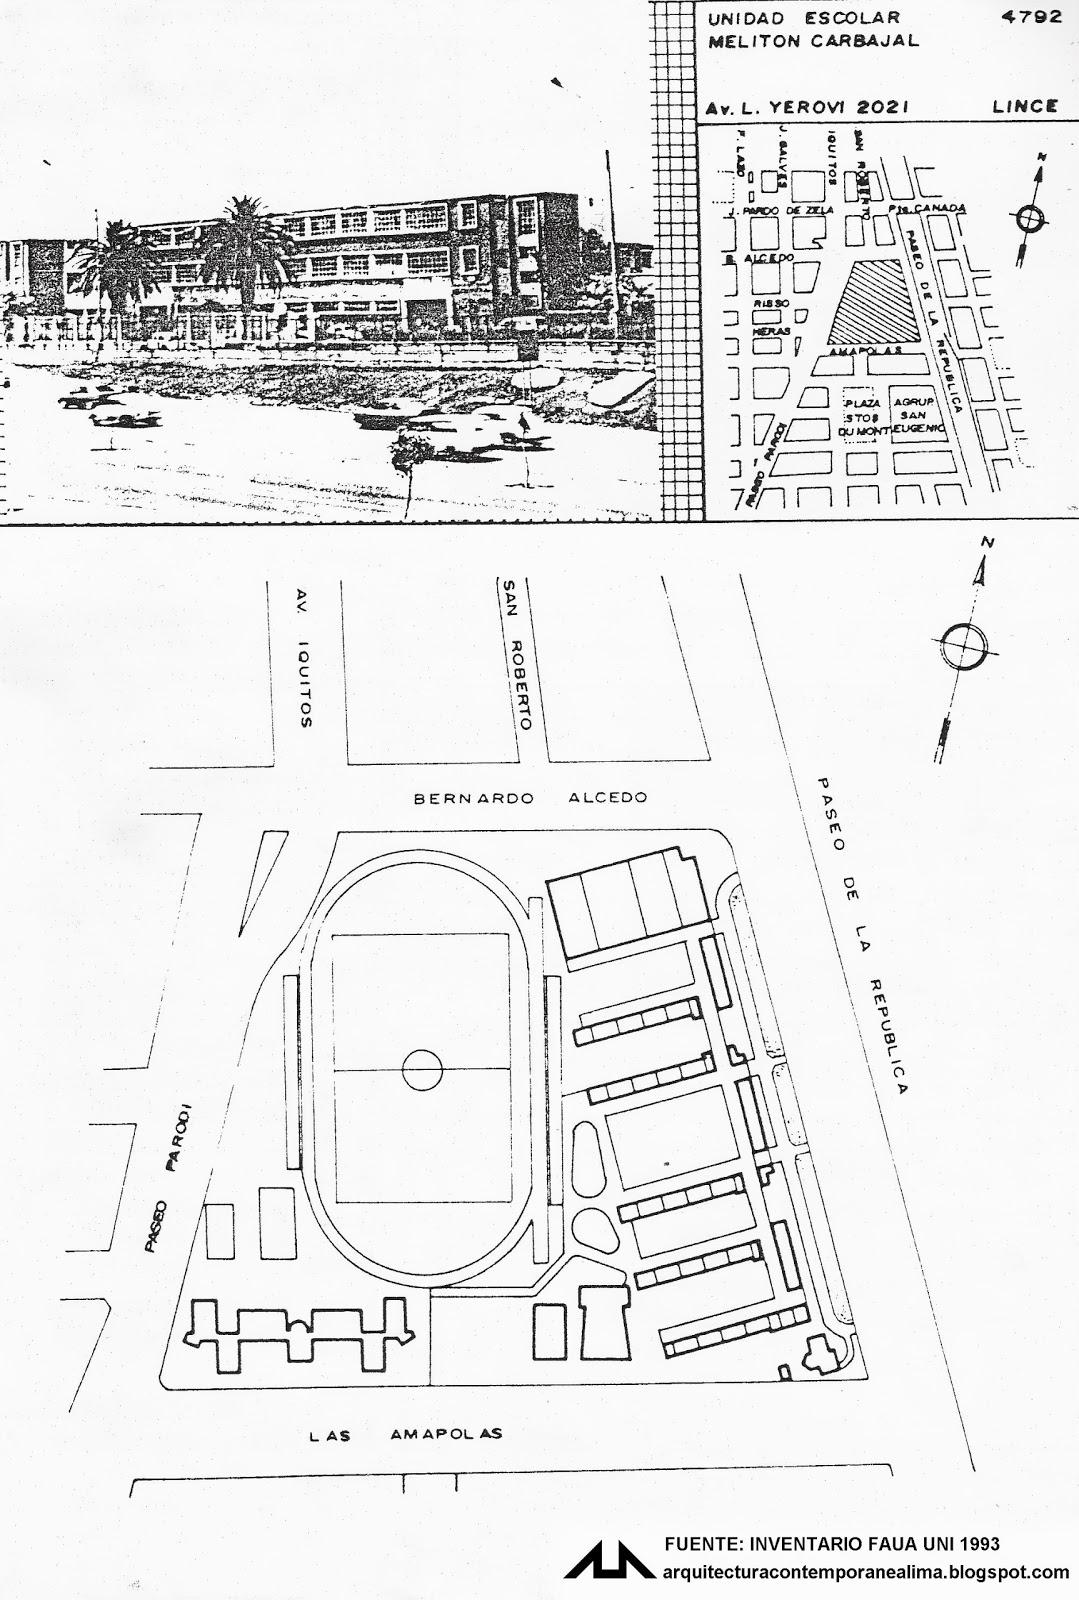 Arquitectura contemporanea de lima 4792 unidad escolar for Planos mobiliario escolar peru